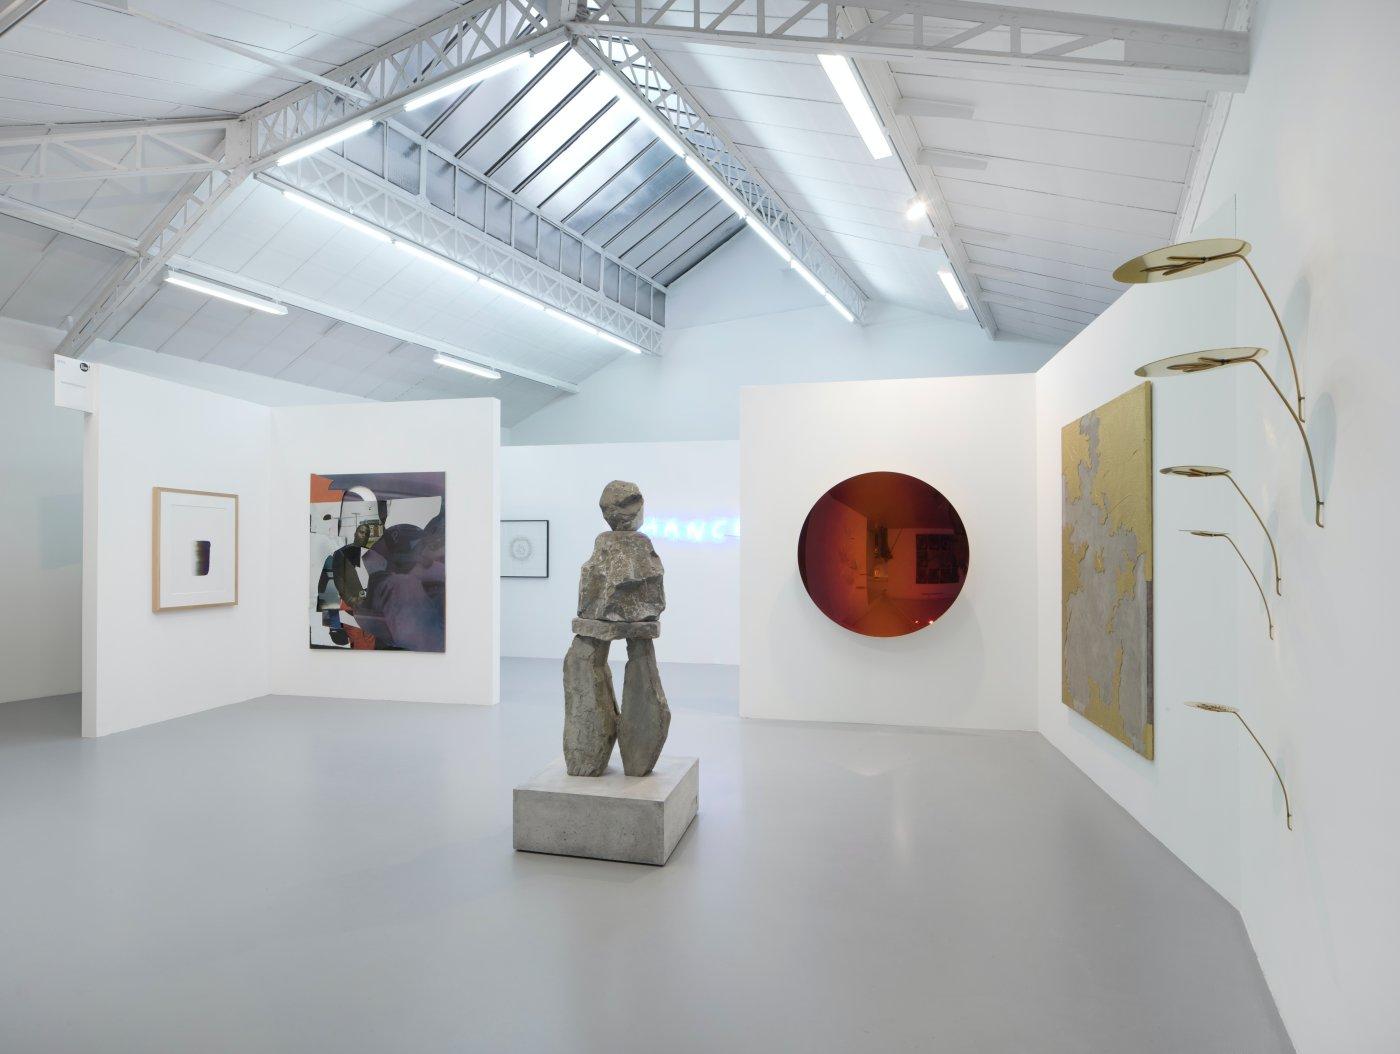 kamel mennour FIAC in the galleries 2